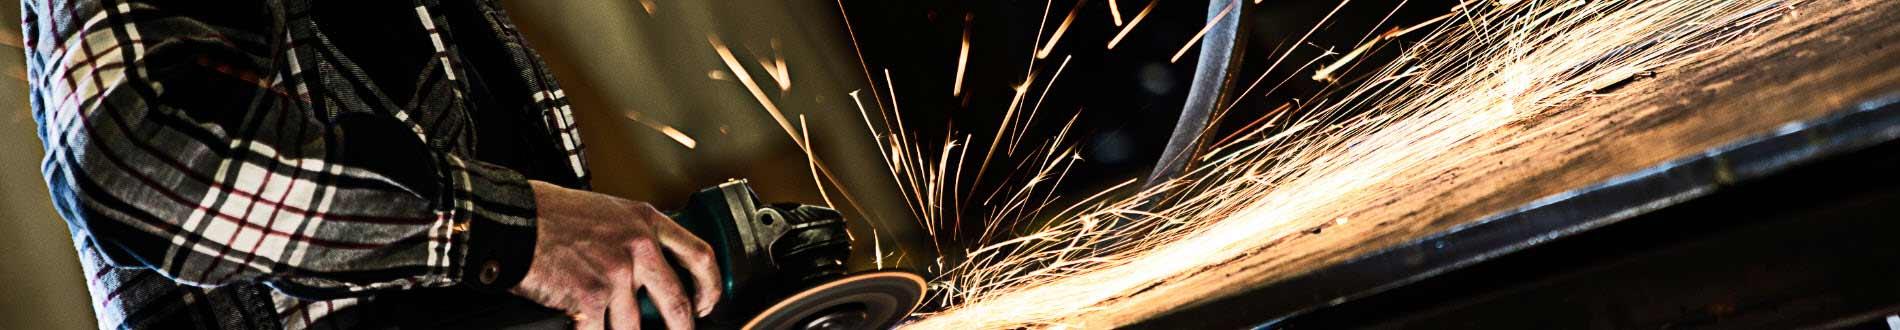 Grinding metal creates fiery sparks.